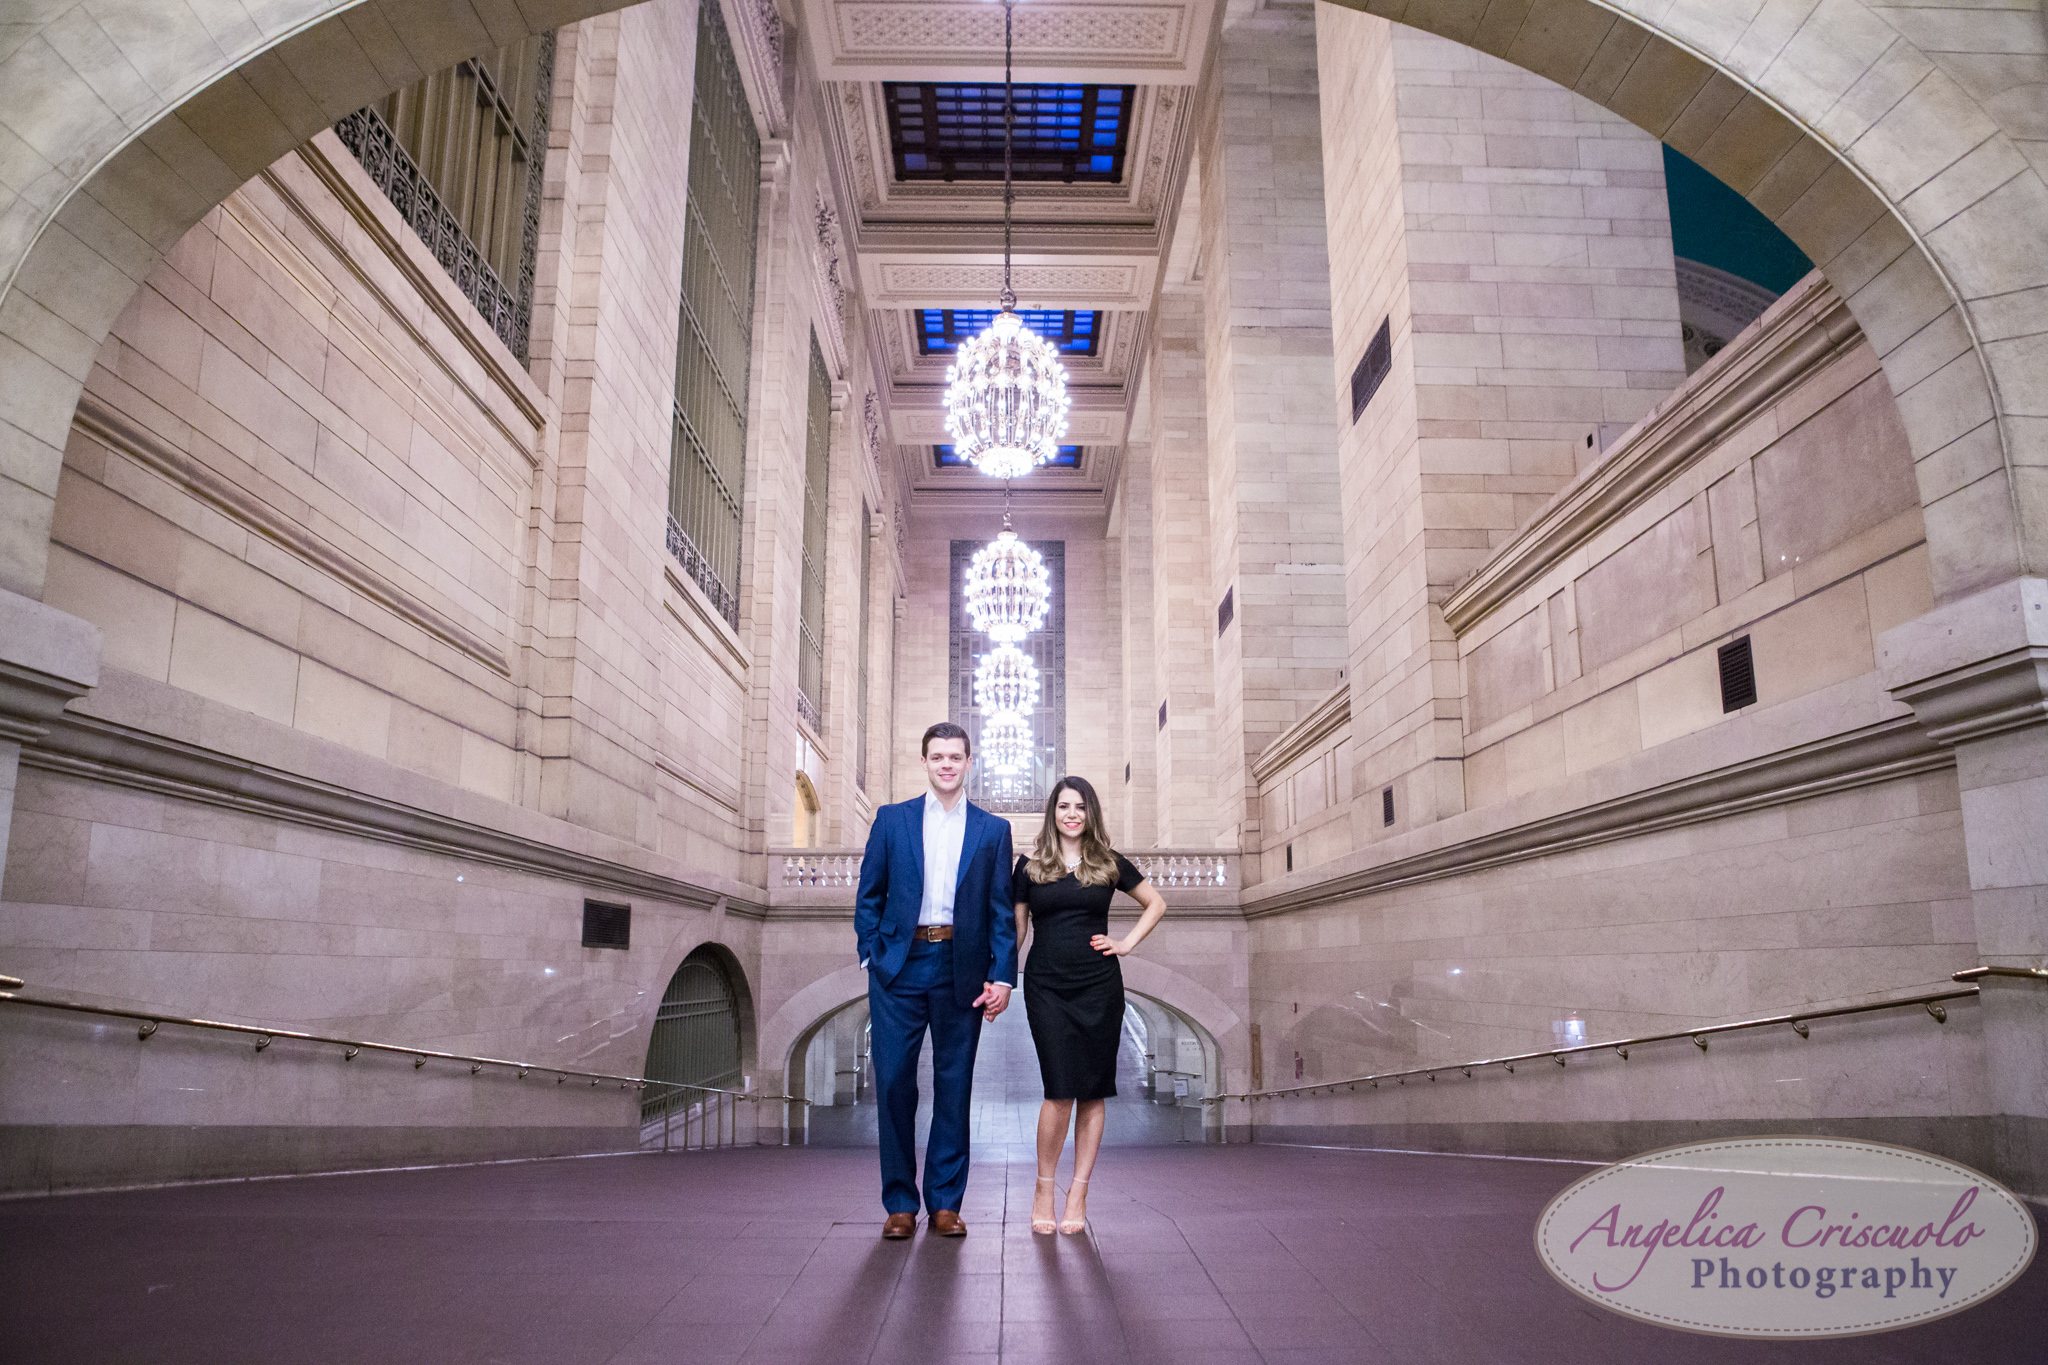 Grand Central Terminal Photographer